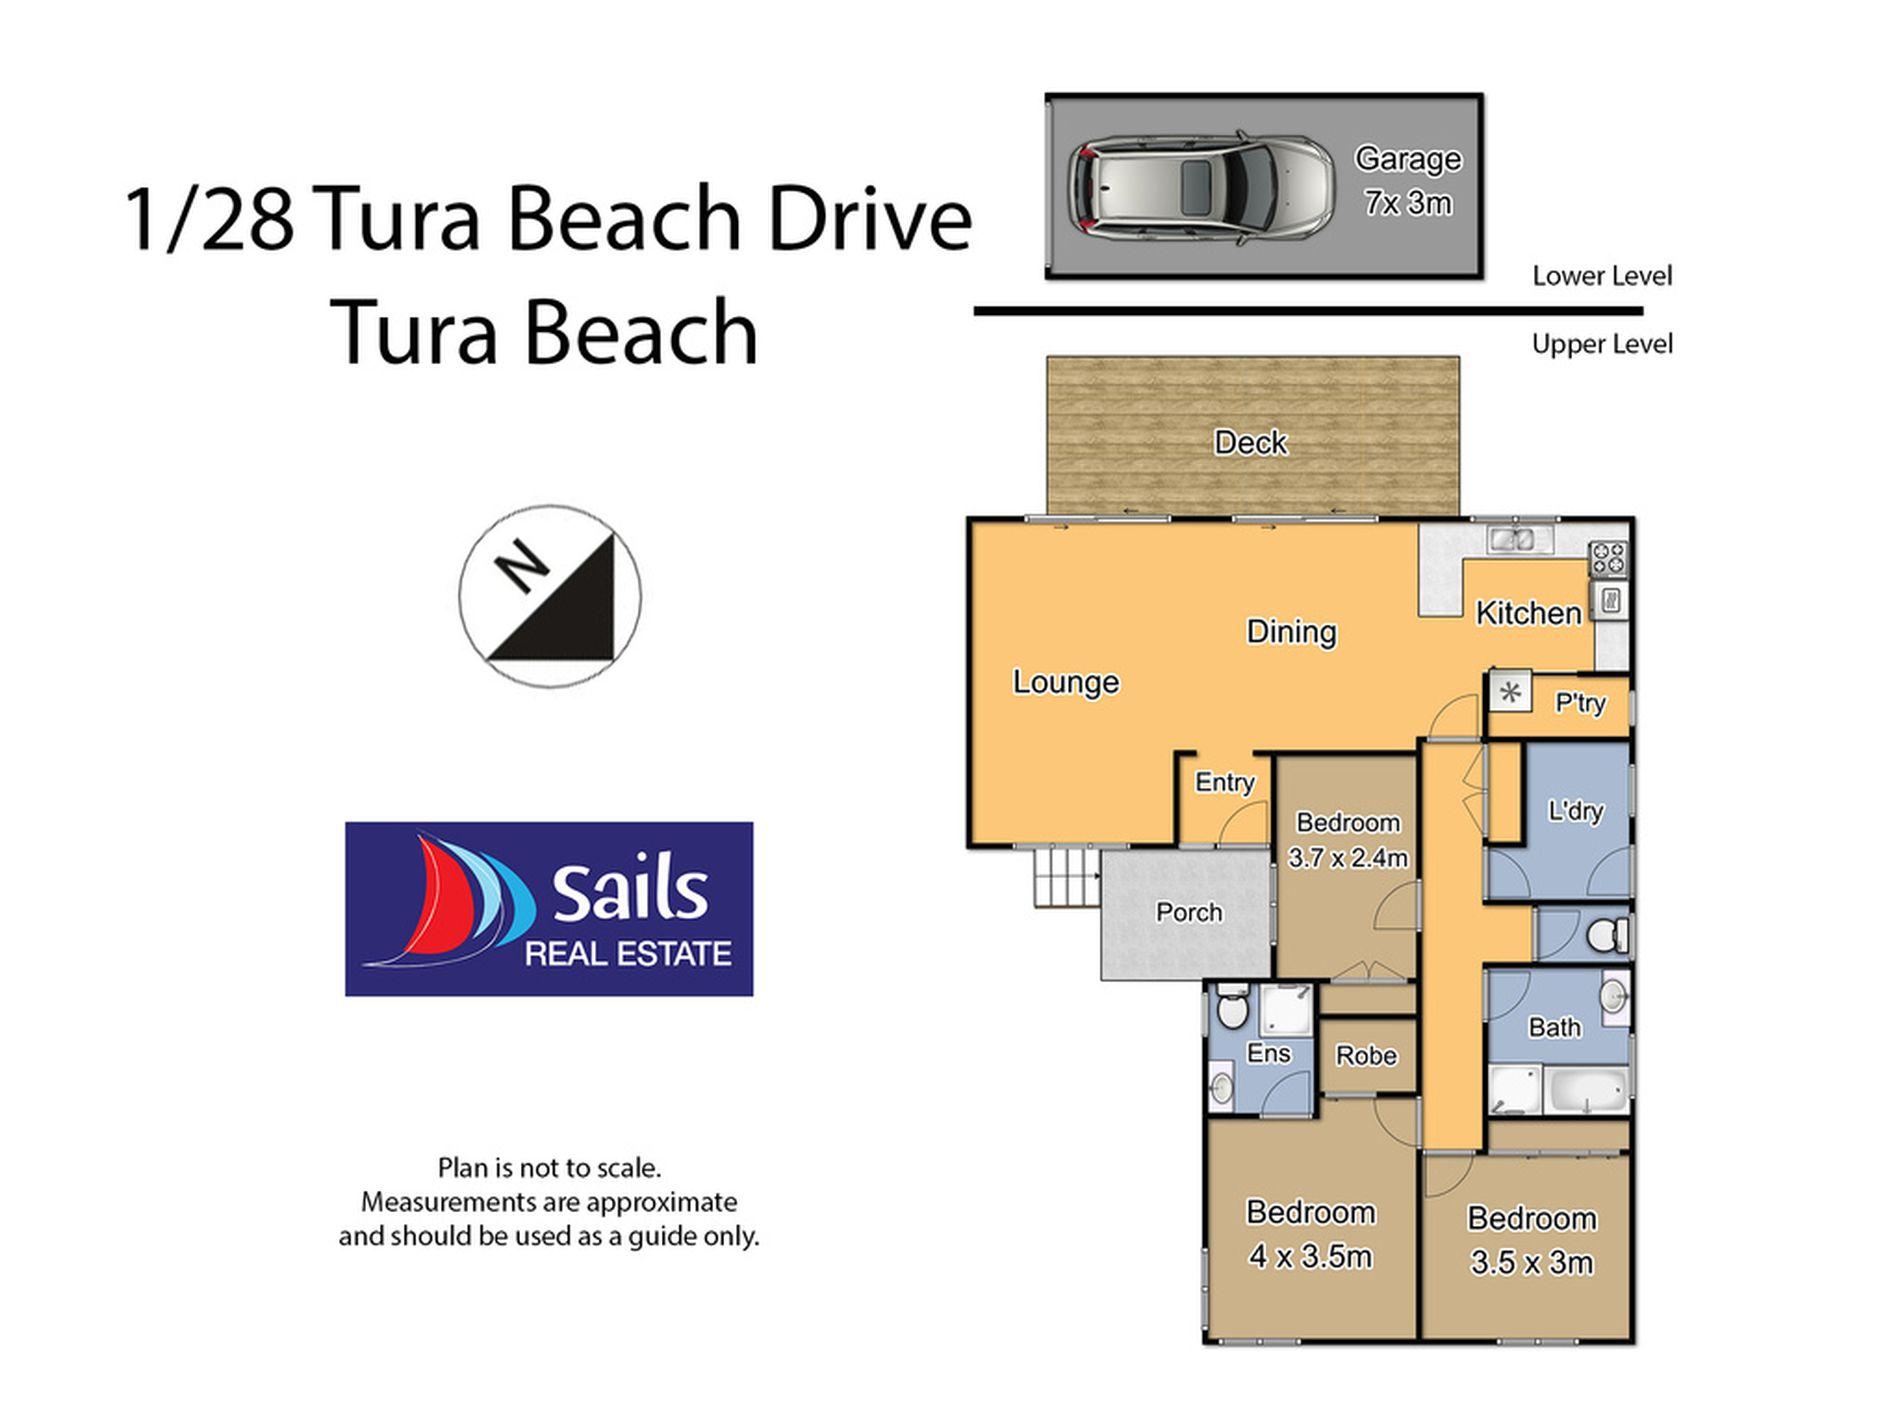 1 / 28 Tura Beach Drive, Tura Beach